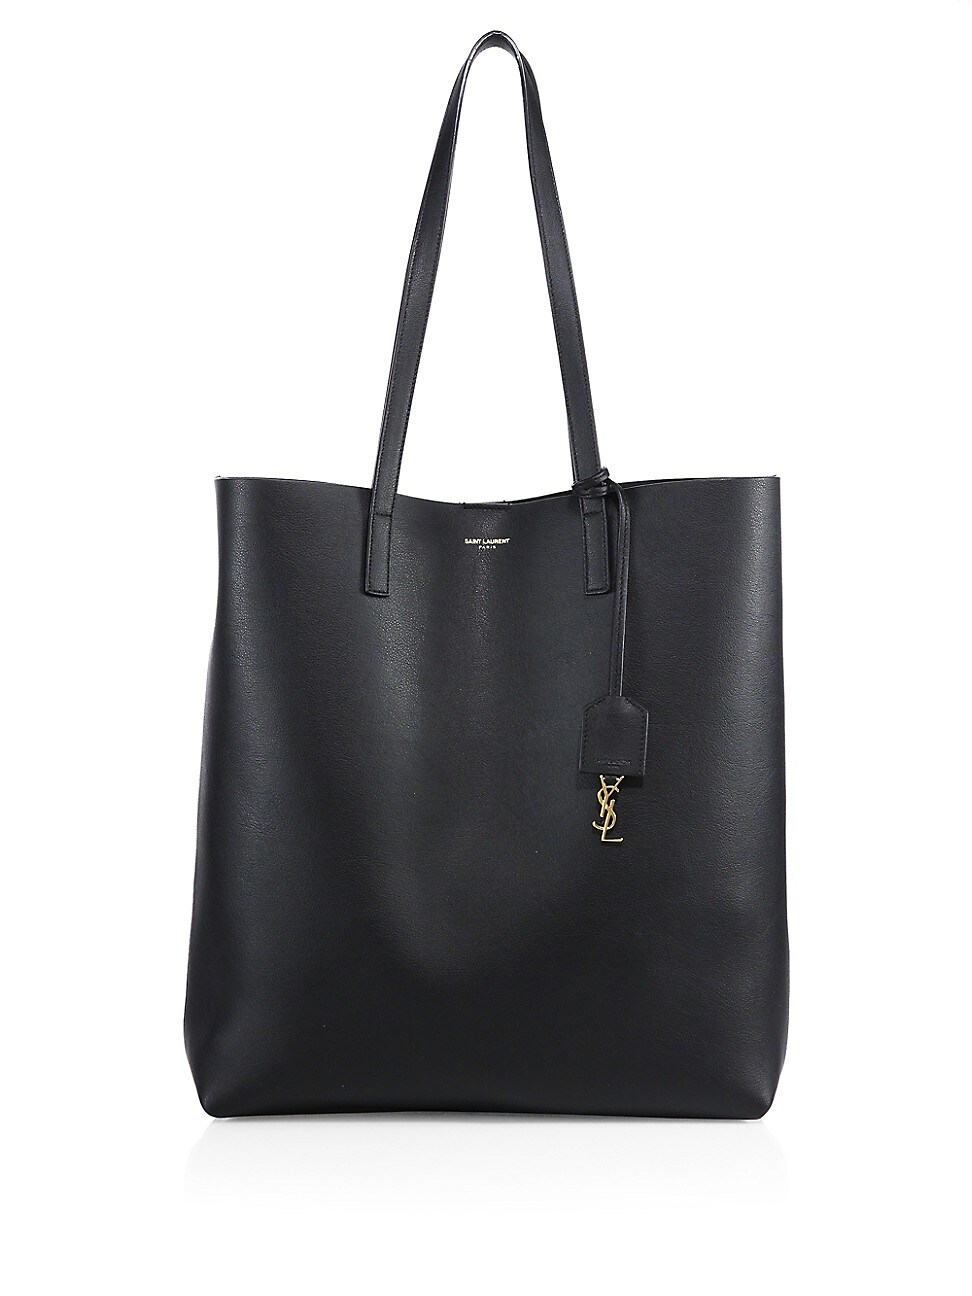 Saint Laurent Leather Shopper Tote Bag In Nero